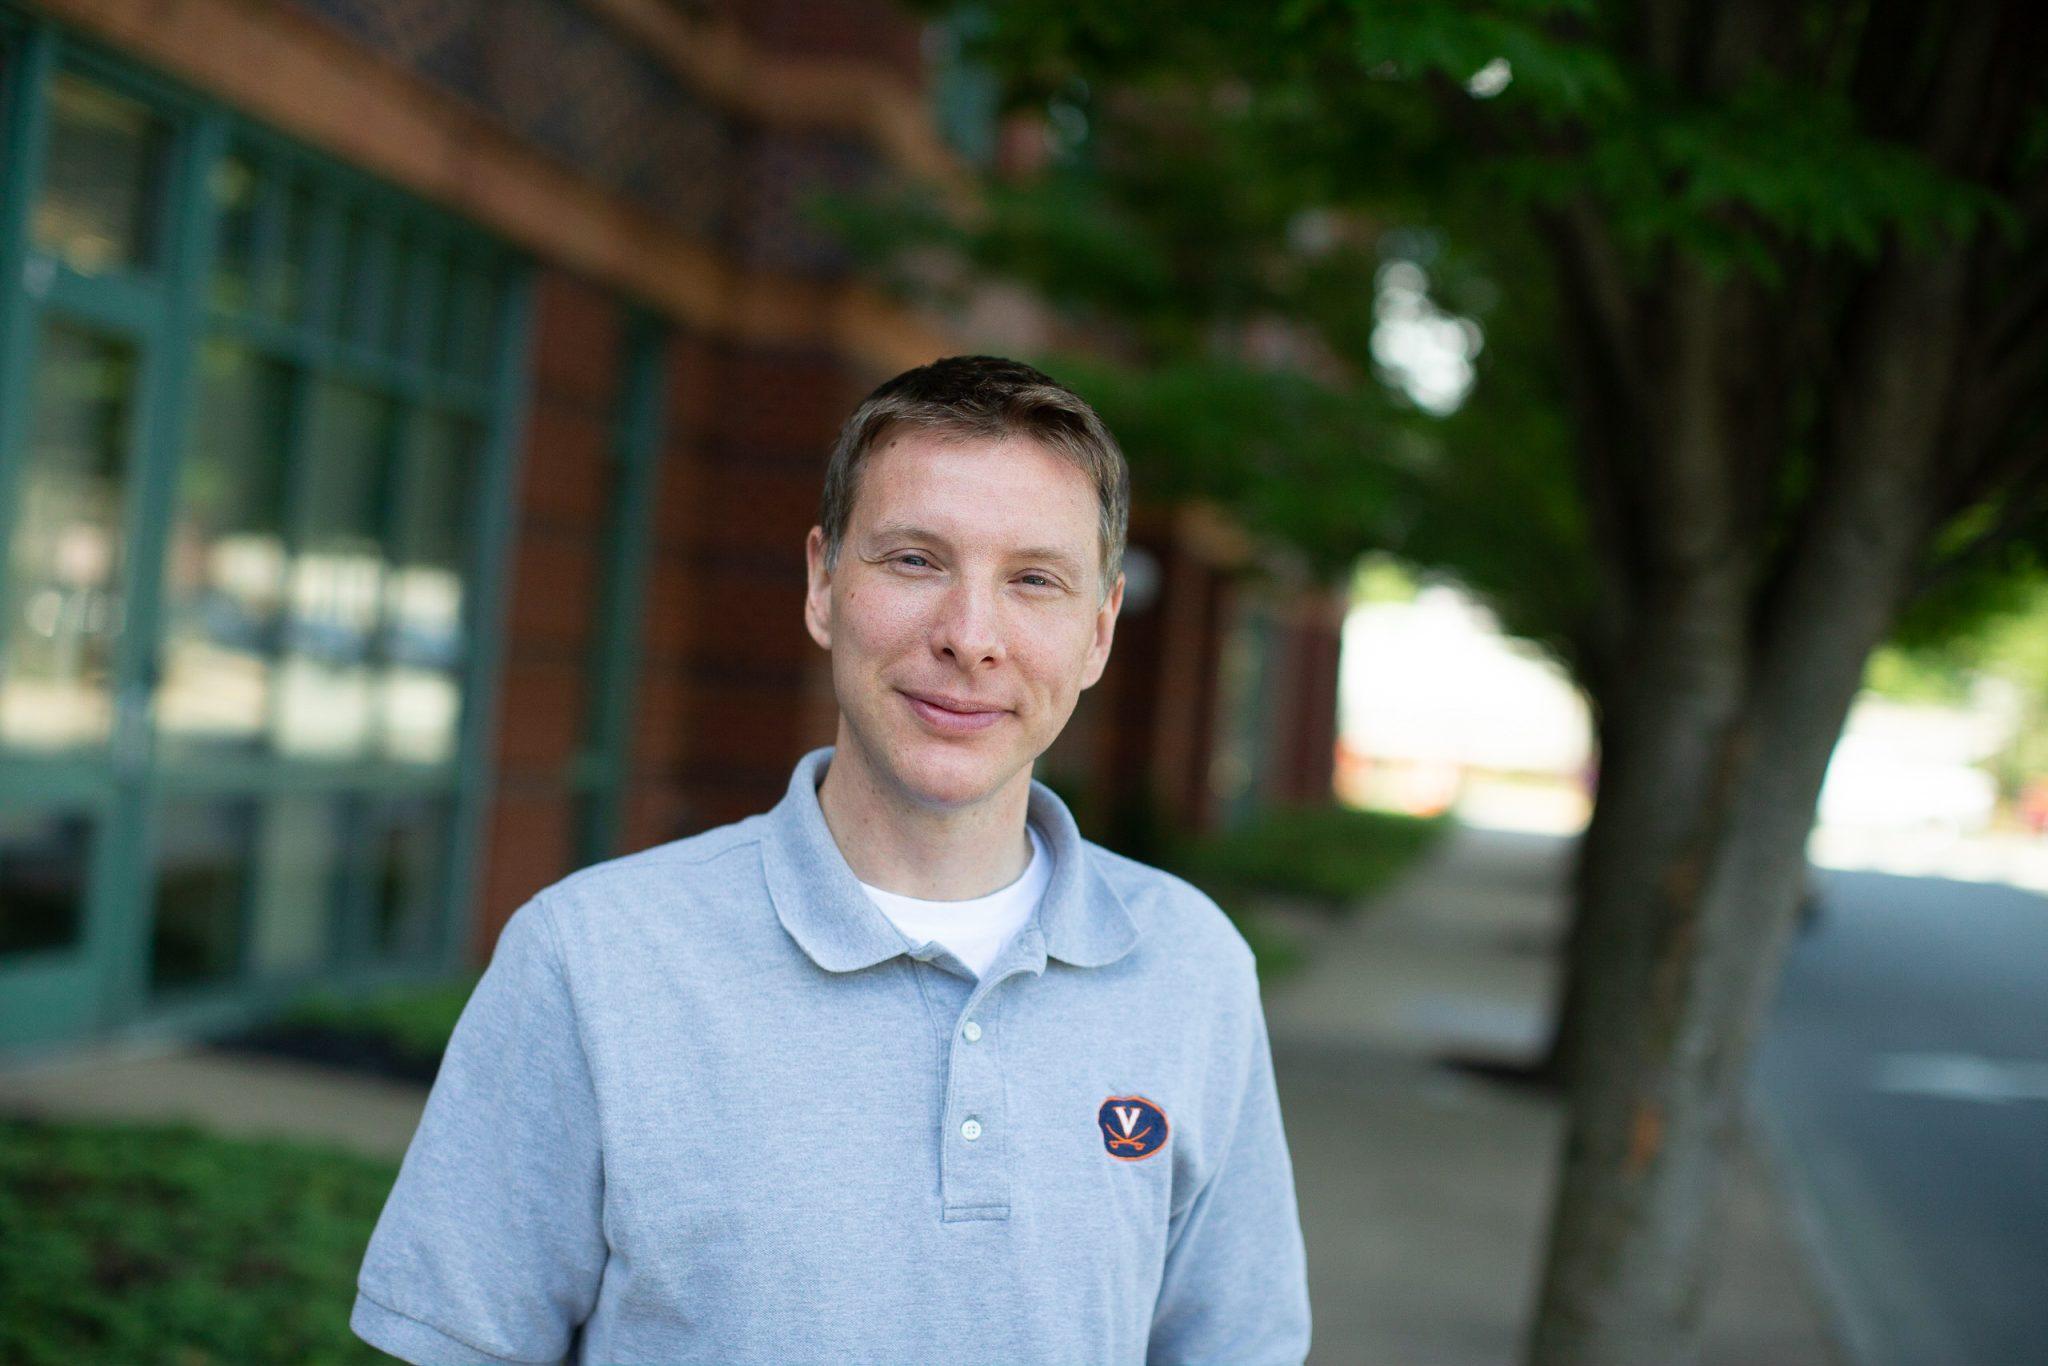 Peter Mackey, Director of Mechanical Engineering, Celebrates 15 Years with 2RW!